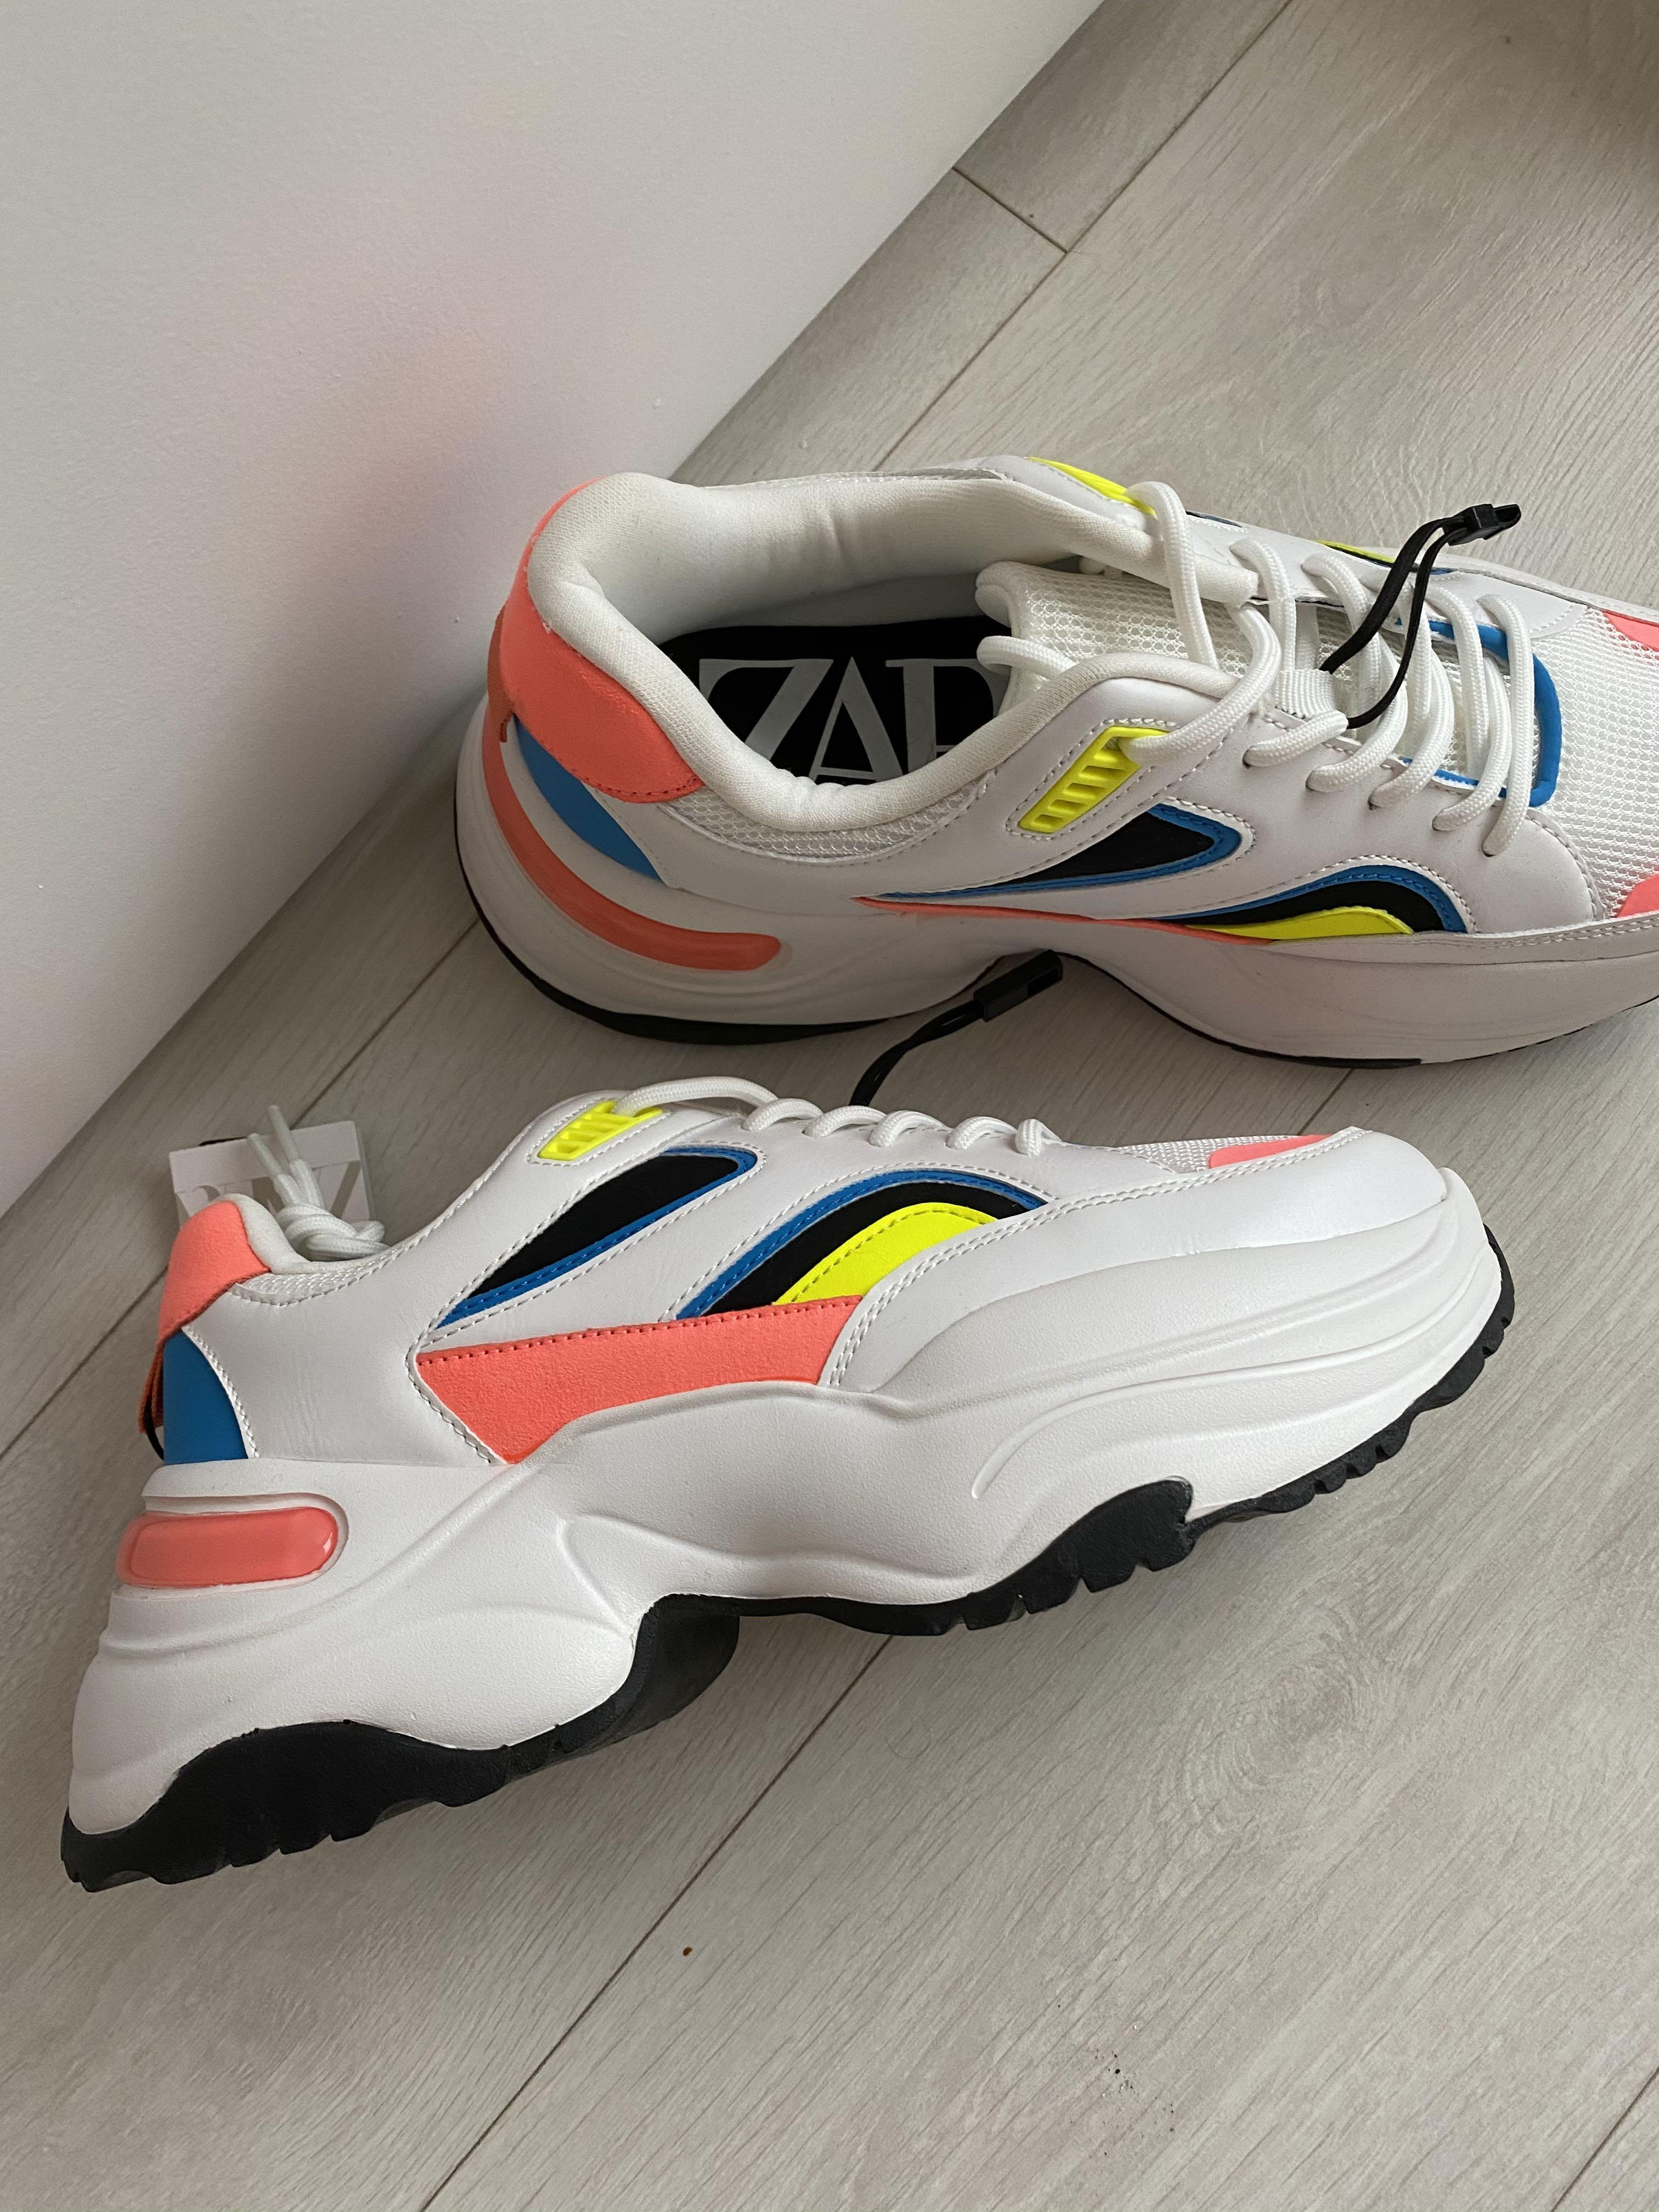 BNWT White Sneakers